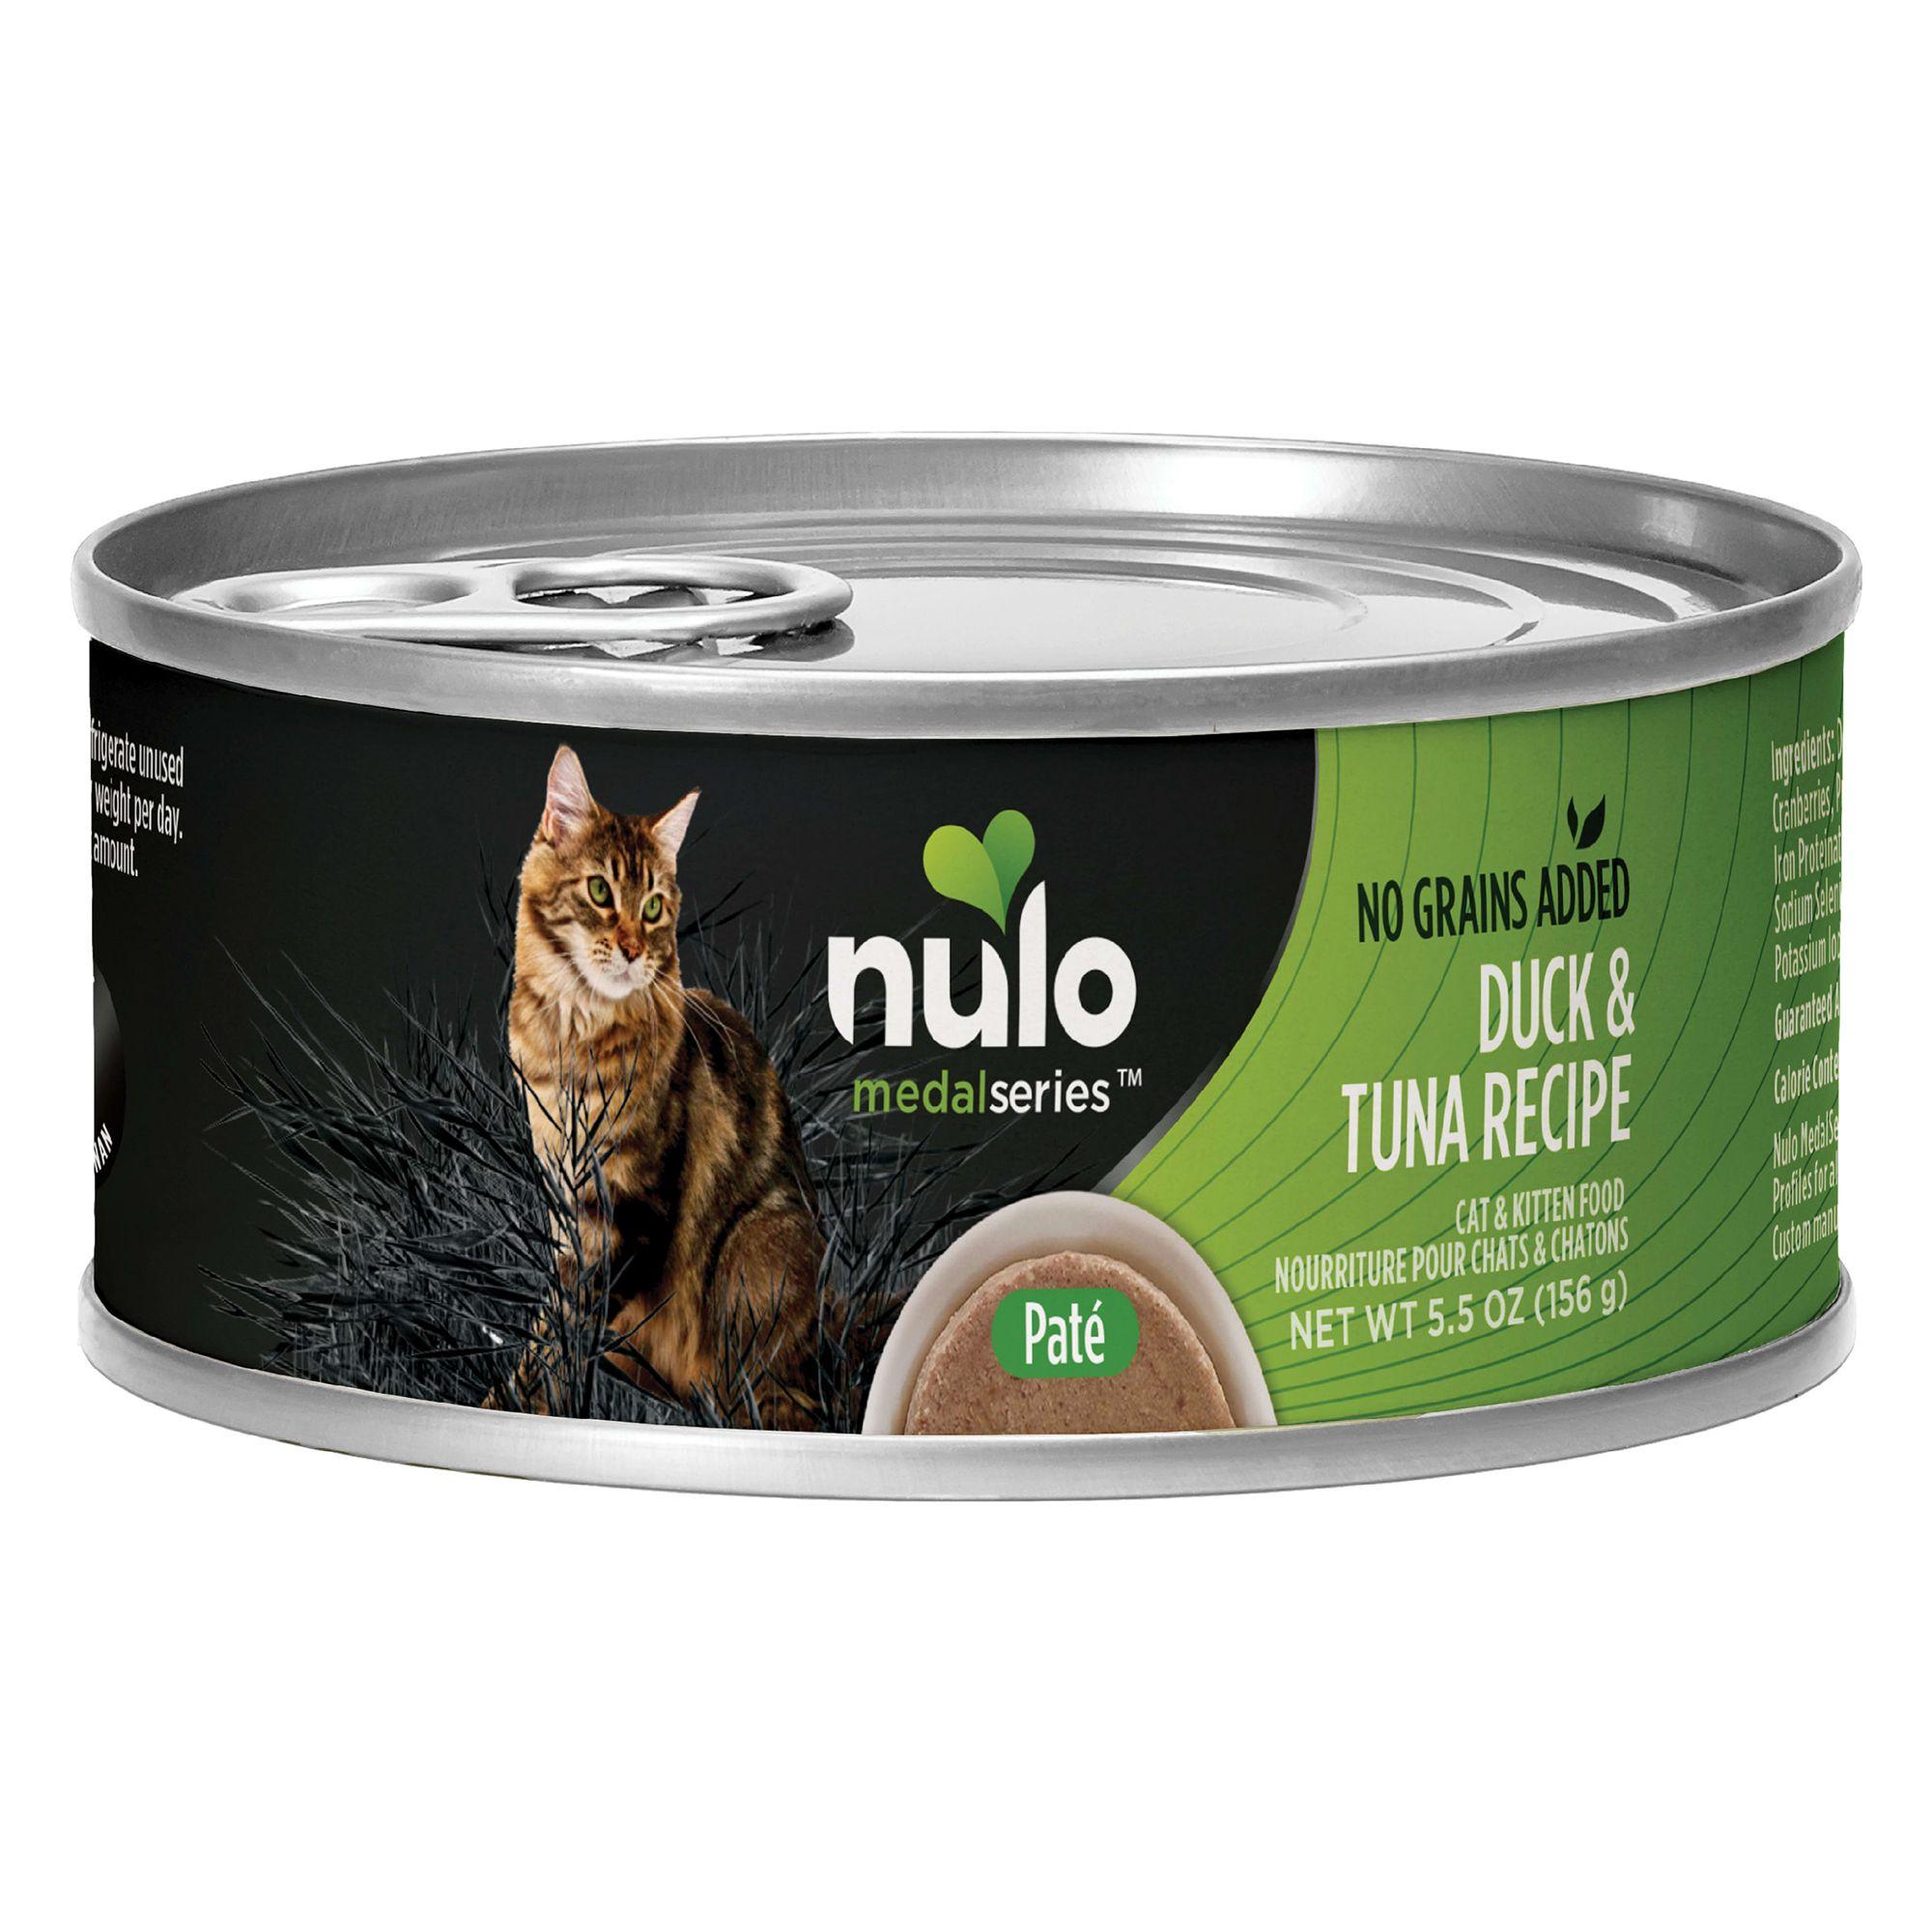 Nulo Medalseries Cat Kitten Food Grain Free Duck Tuna Cat